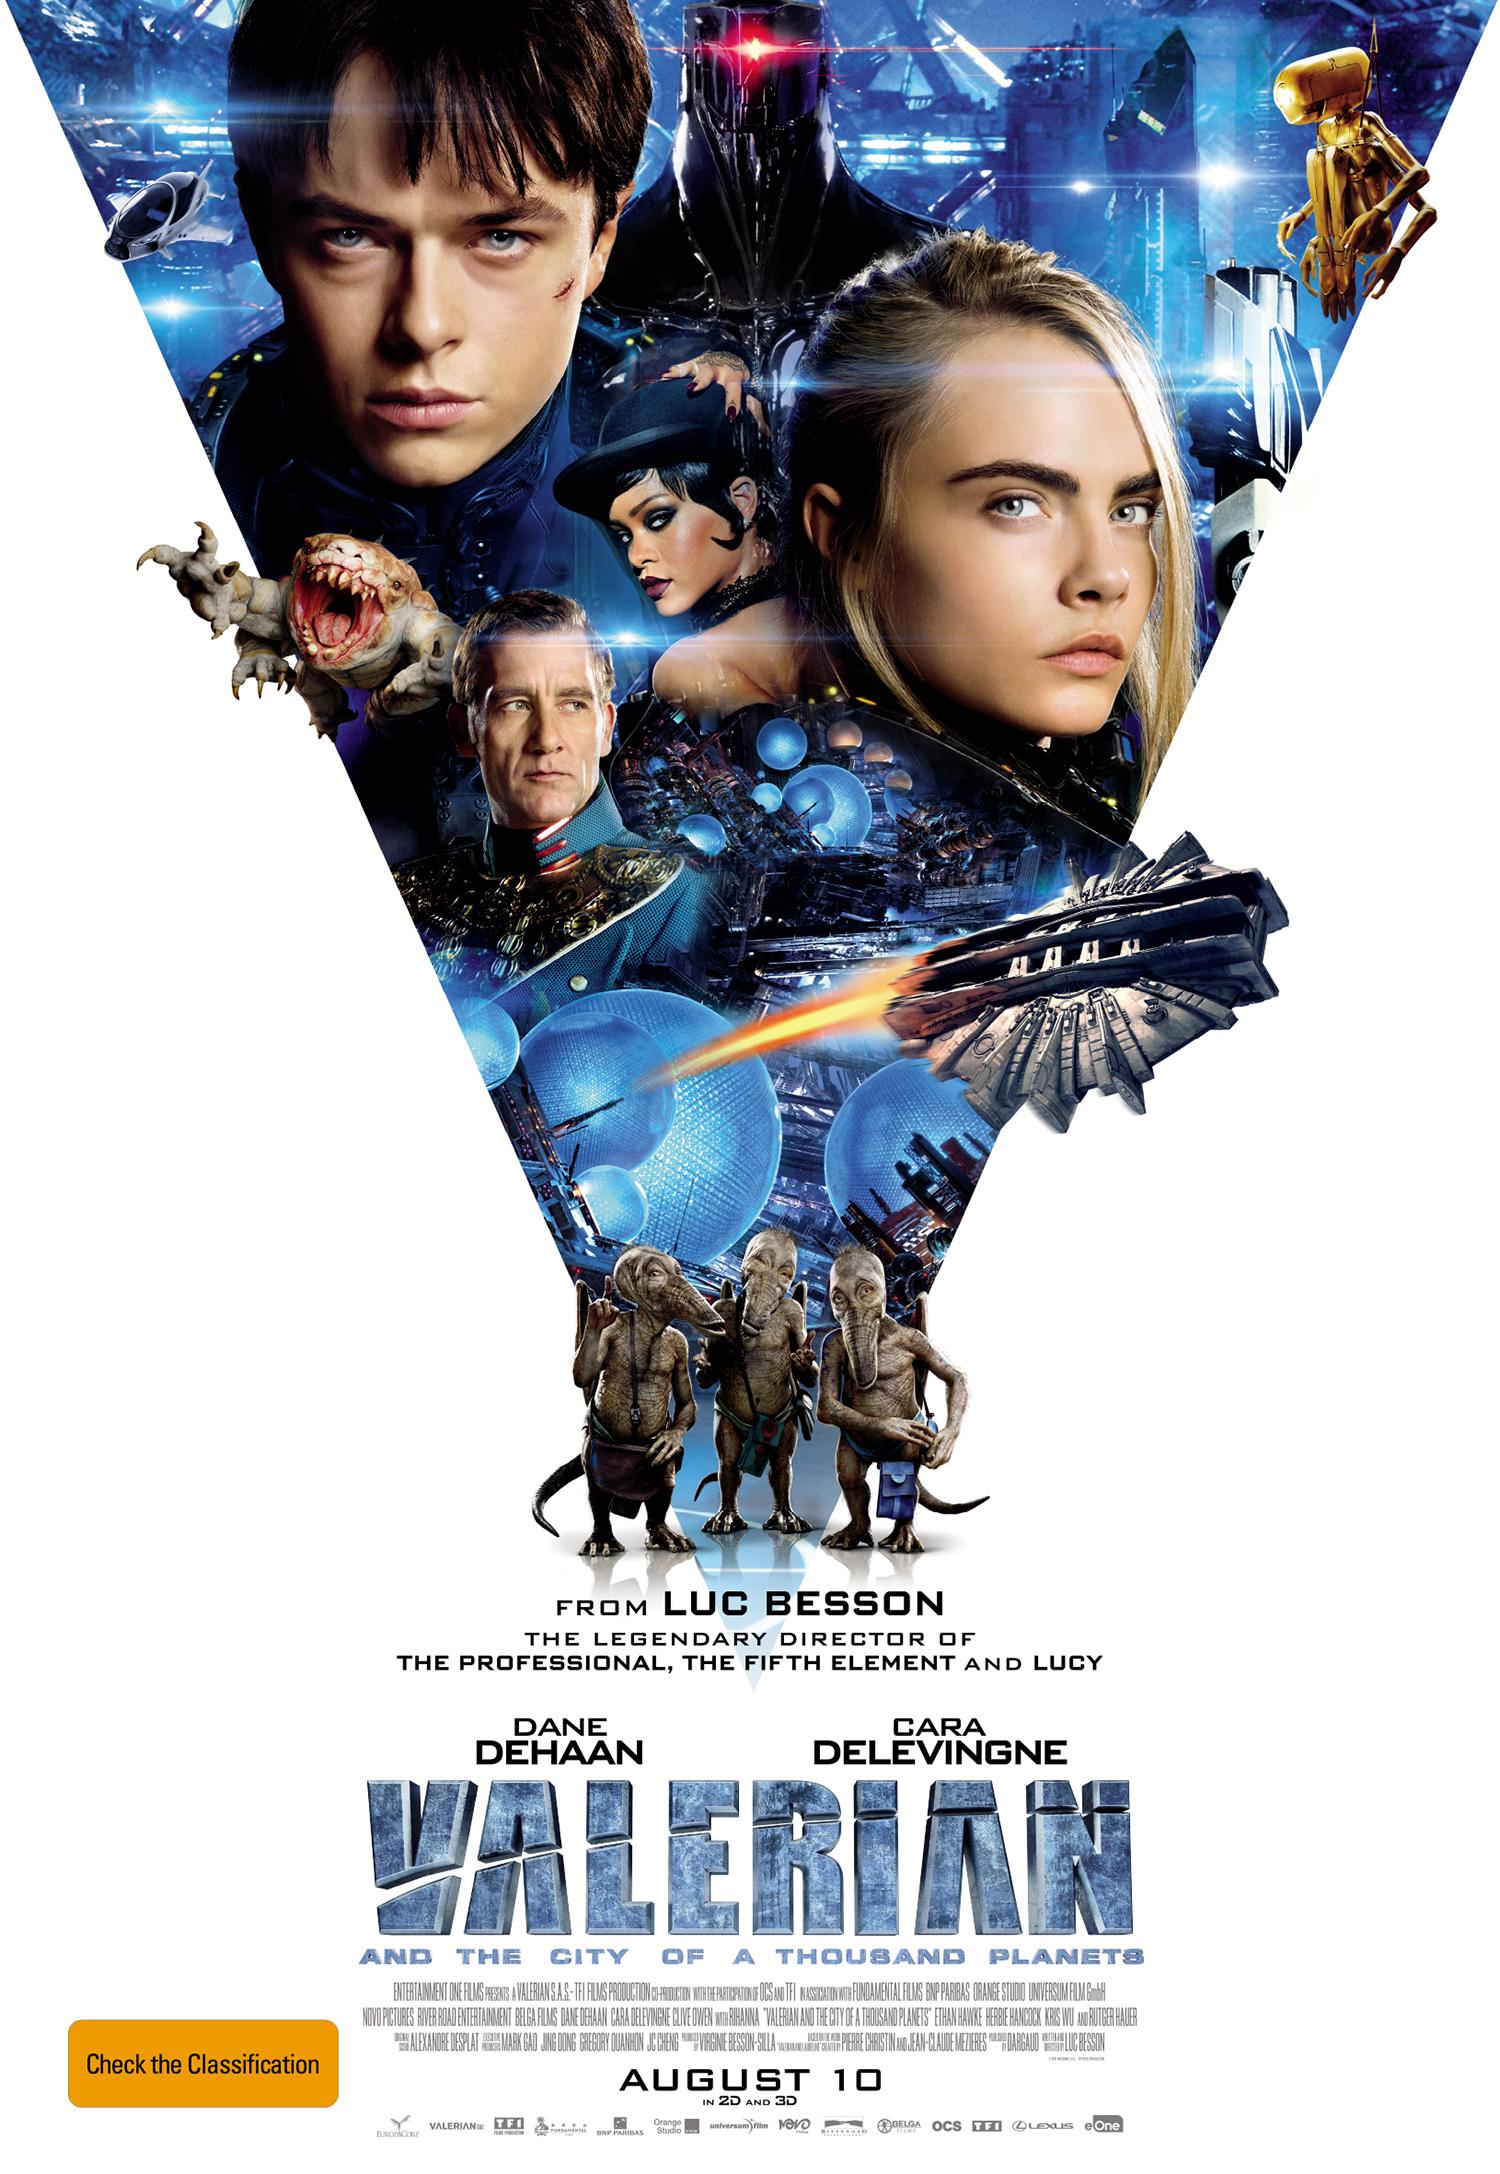 Valerian Movie Poster image